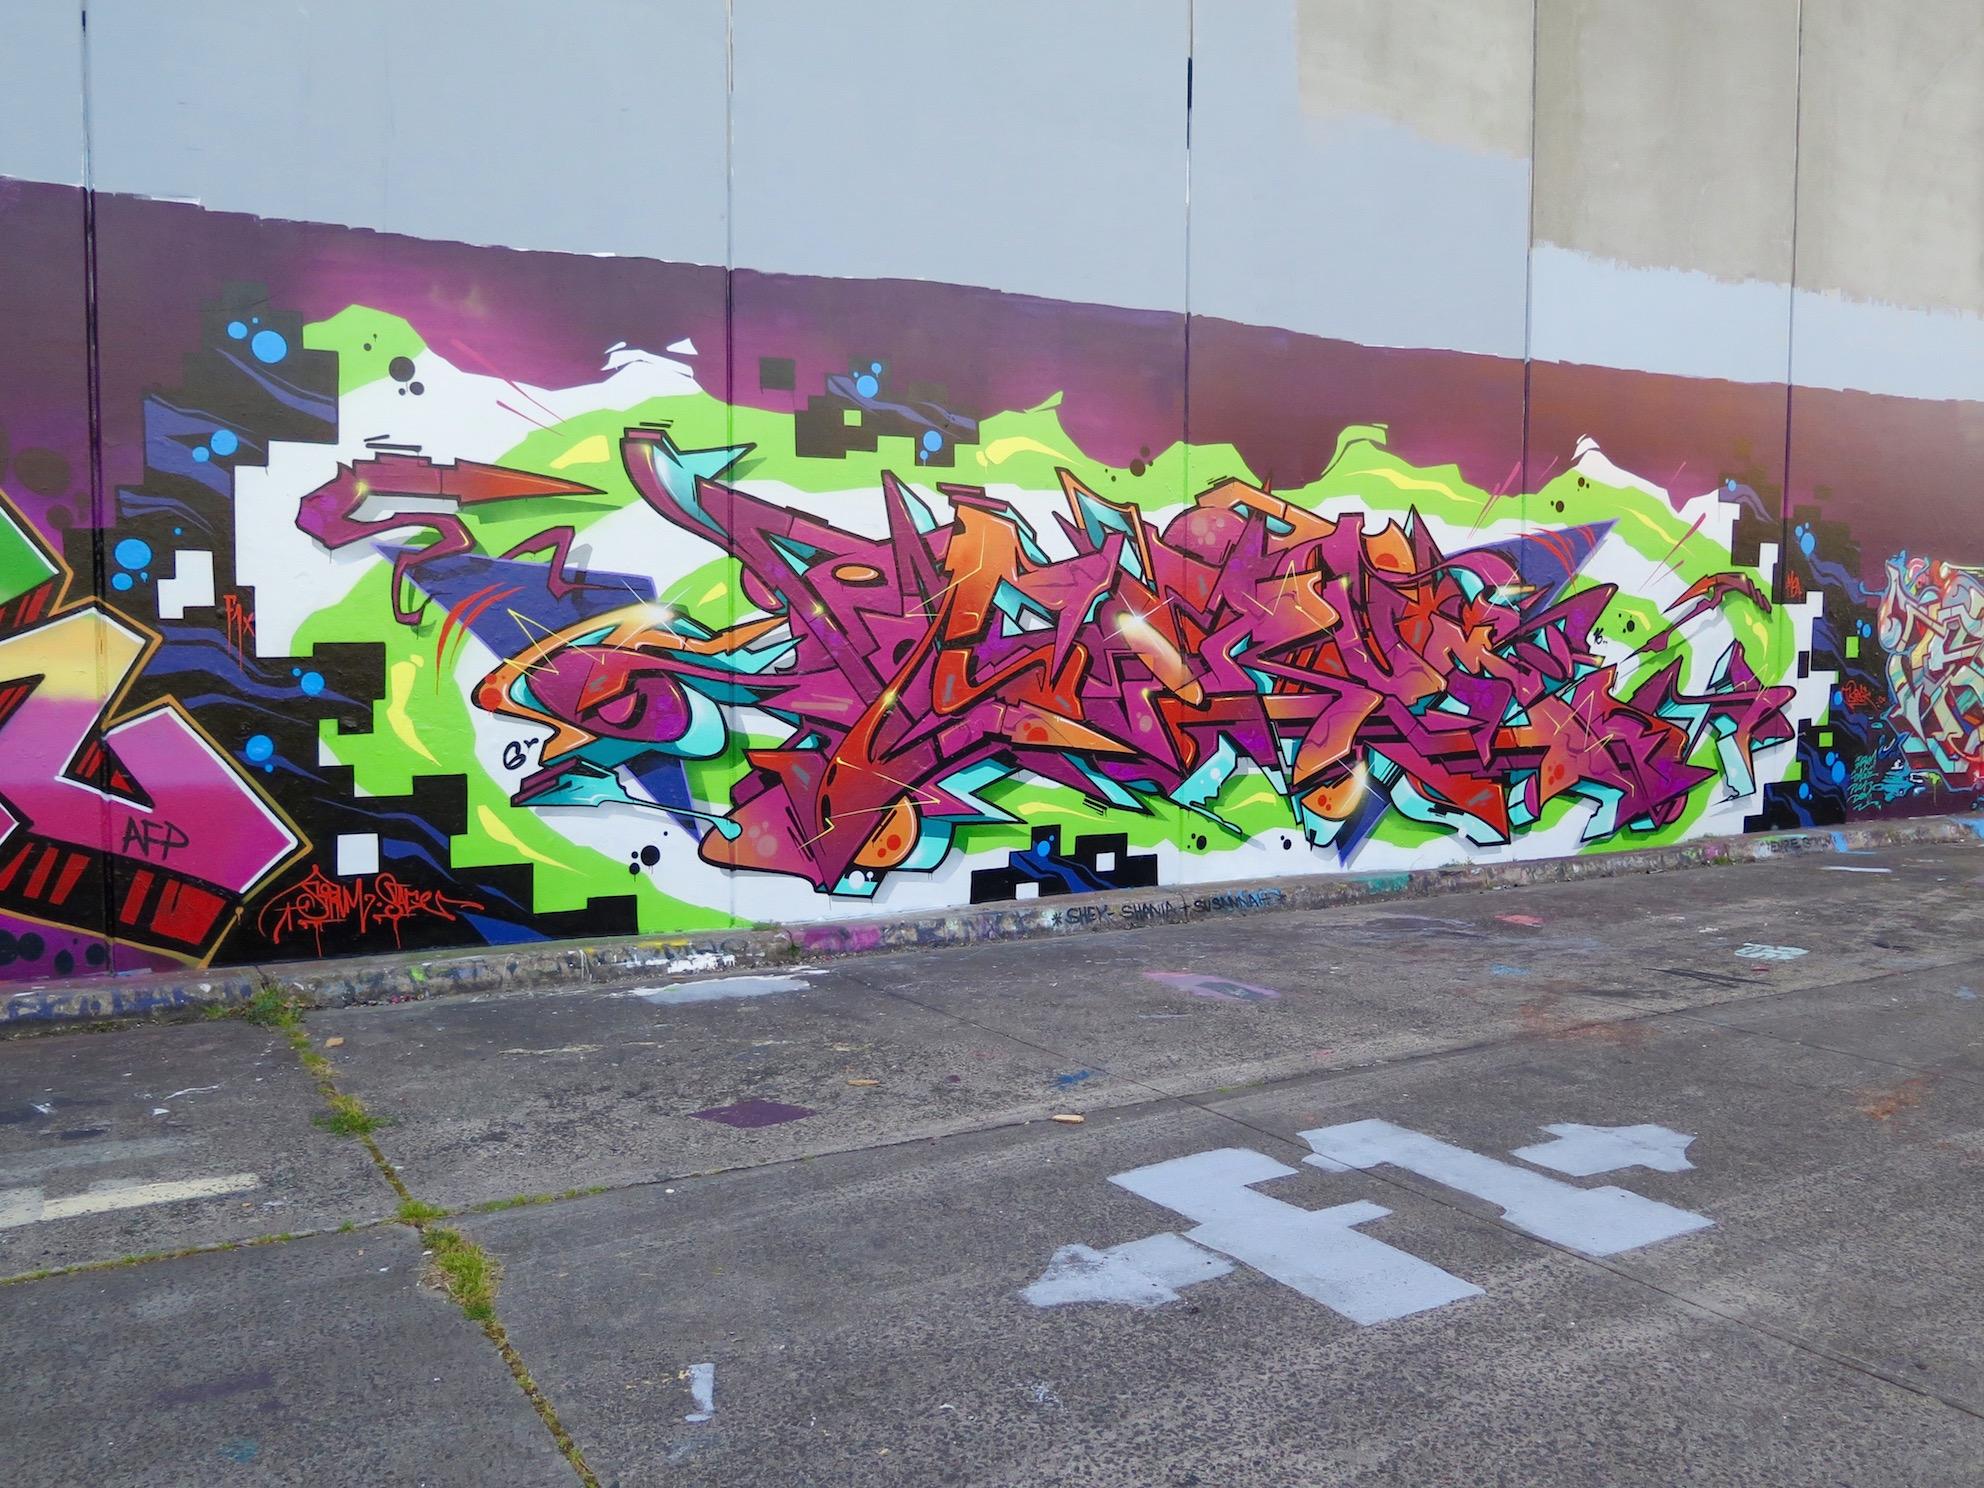 deansunshine_landofsunshine_melbourne_streetart_graffiti_invurt-top-ten-66-1-sirum-1